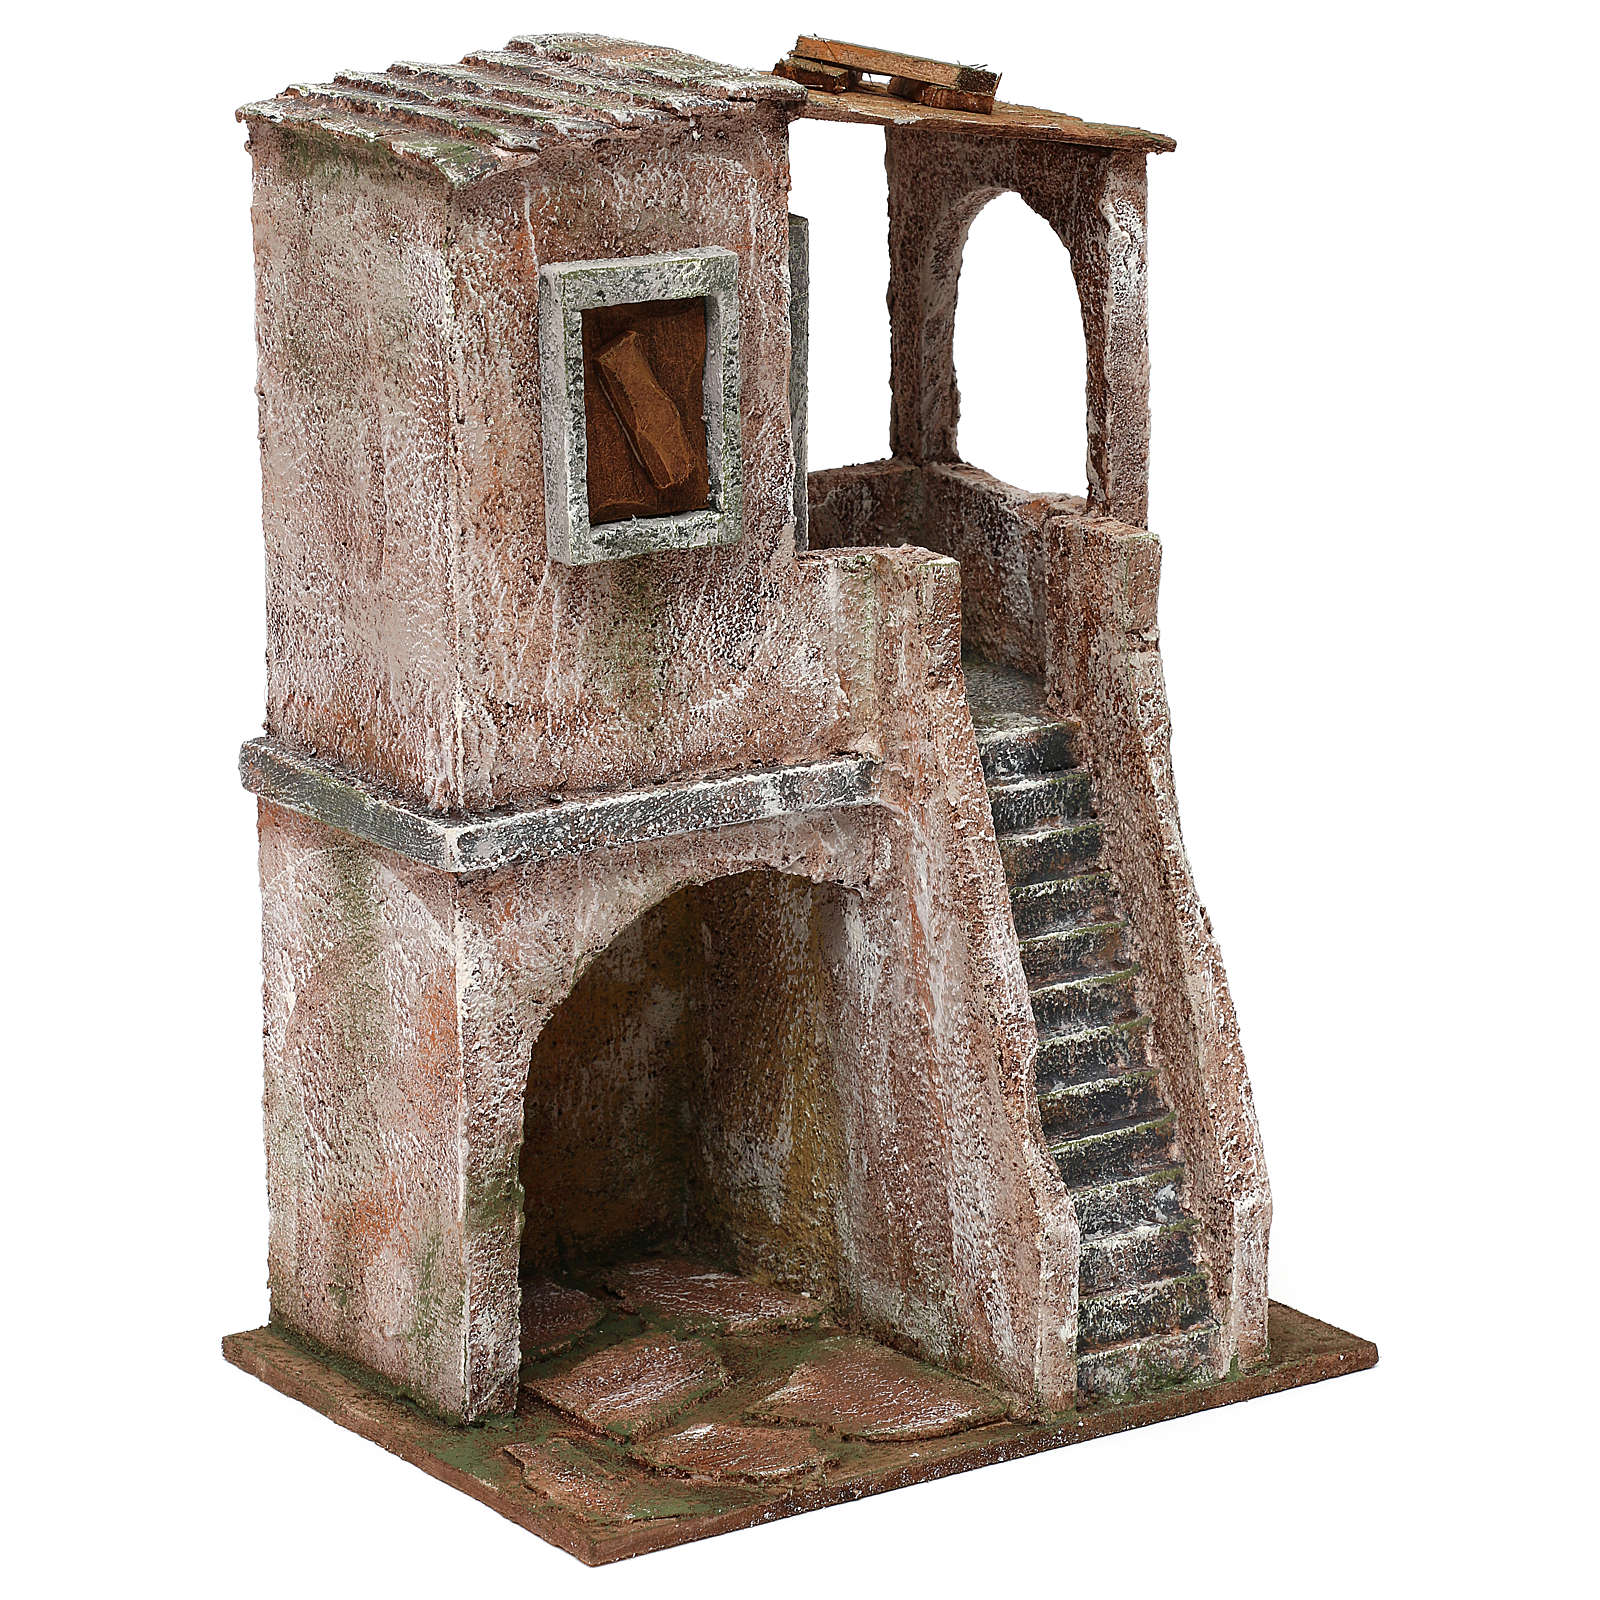 Casetta disposta su 2 piani comunicanti di 30x20x15 cm per presepe 10 cm 4